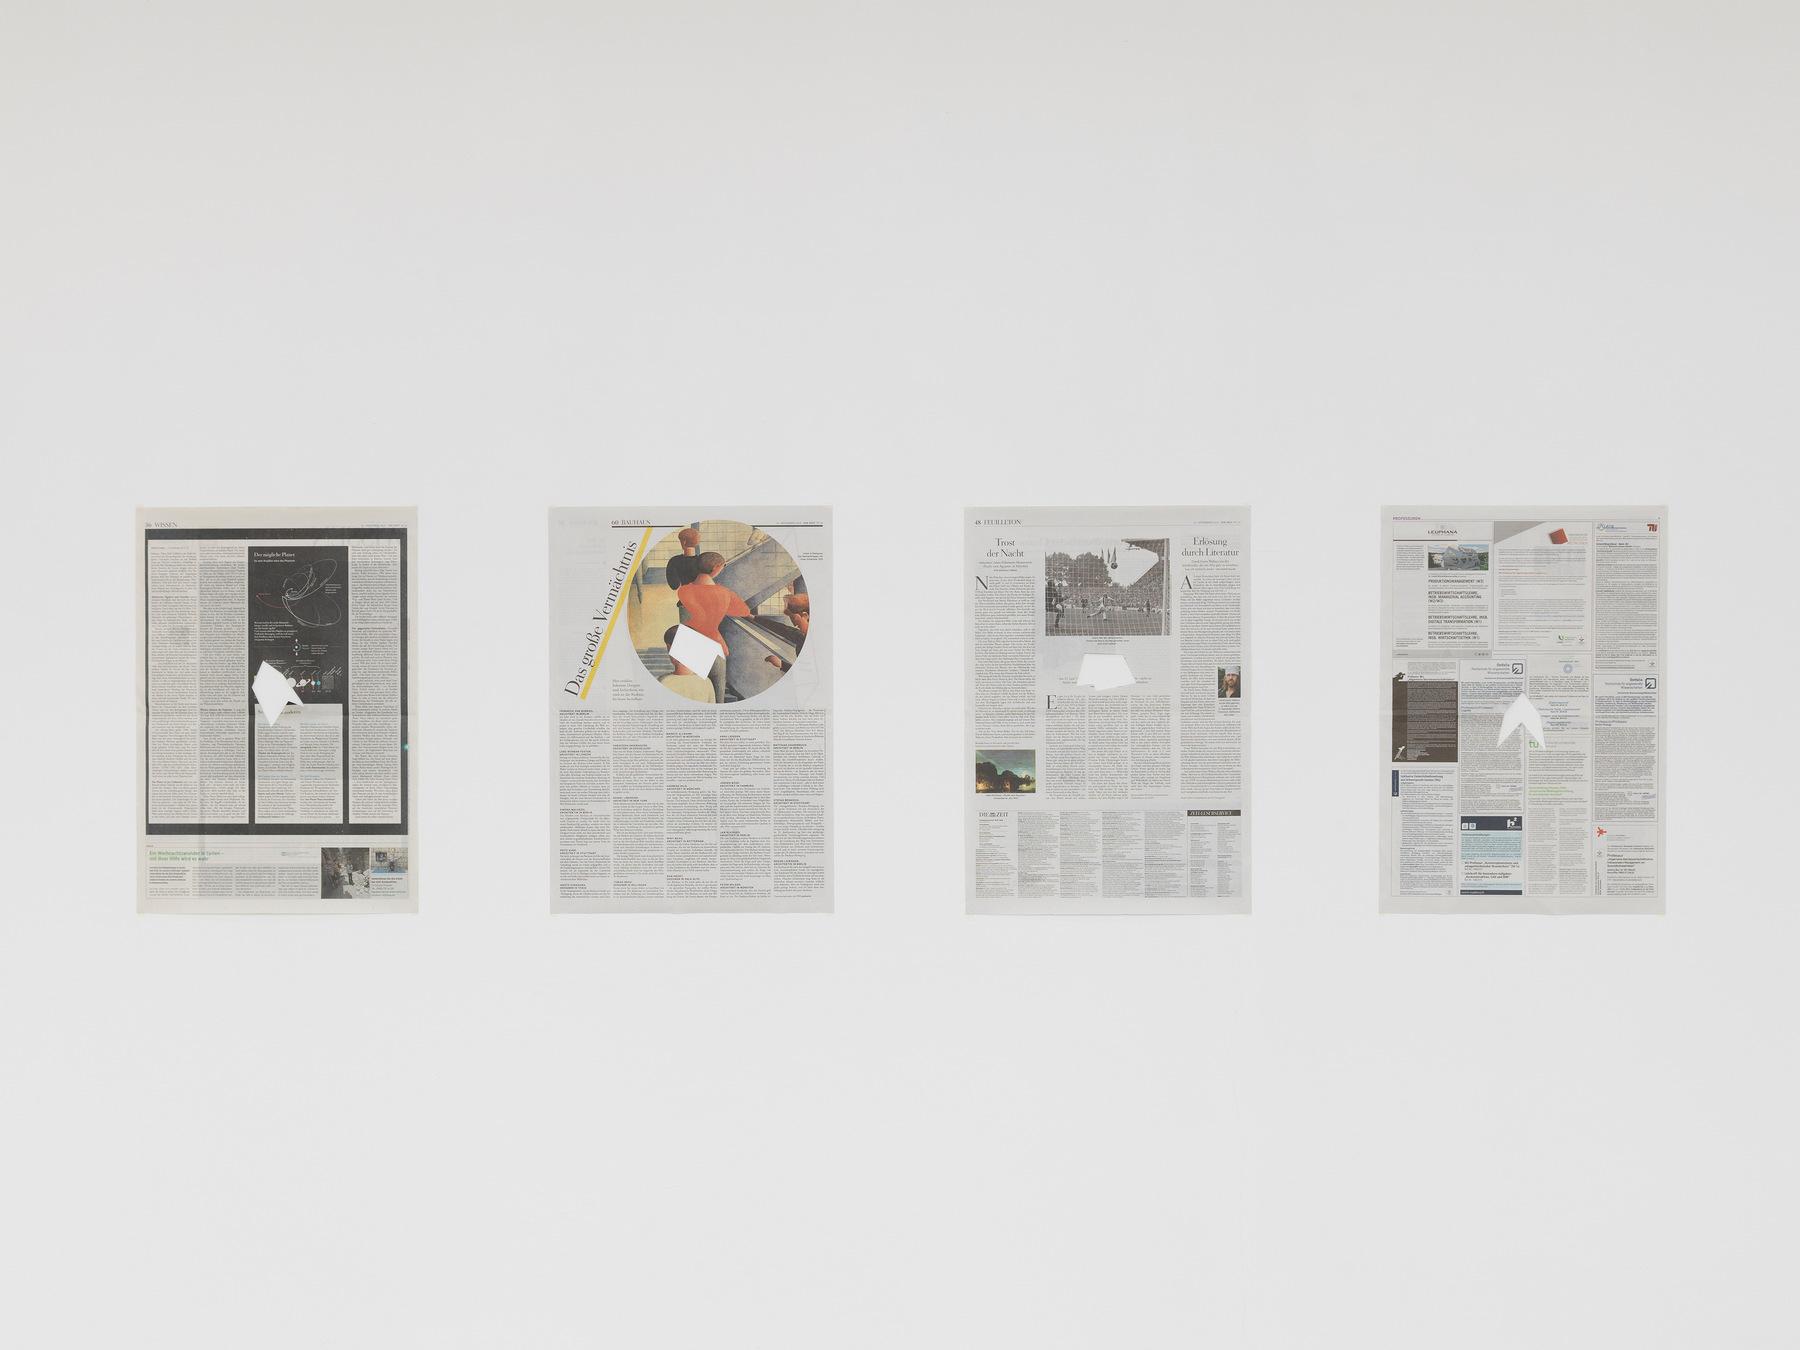 21_Edit Oderbolz_Kunstverein Nürnberg_2017